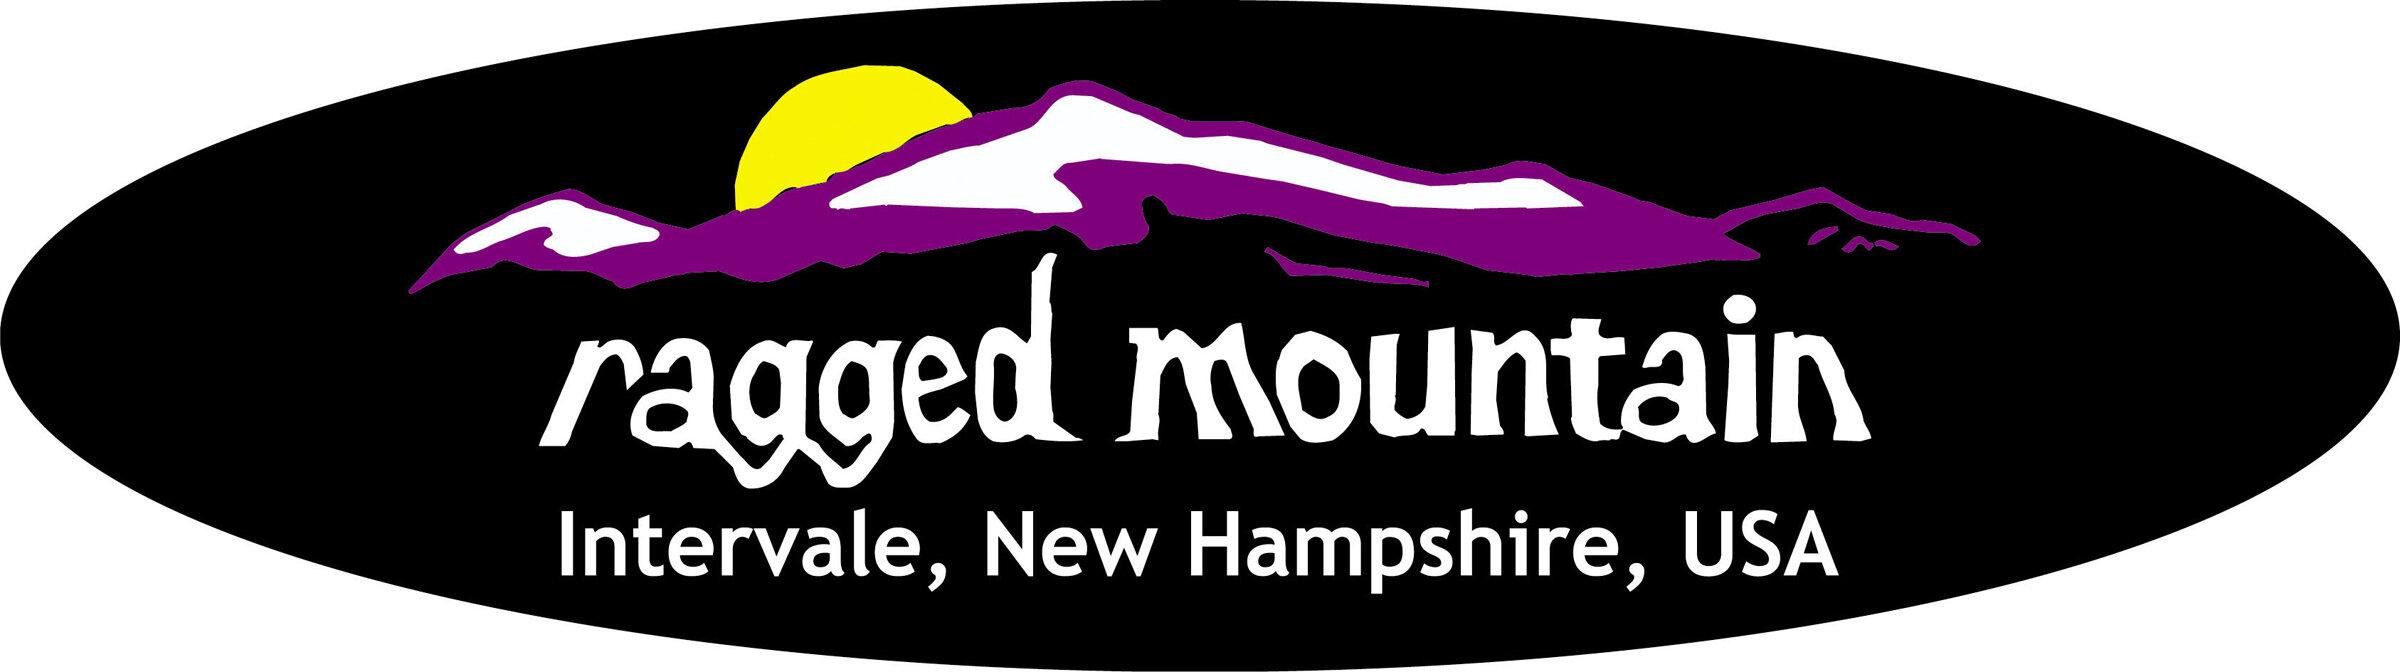 Ragged Mountain logo for BCA.jpg